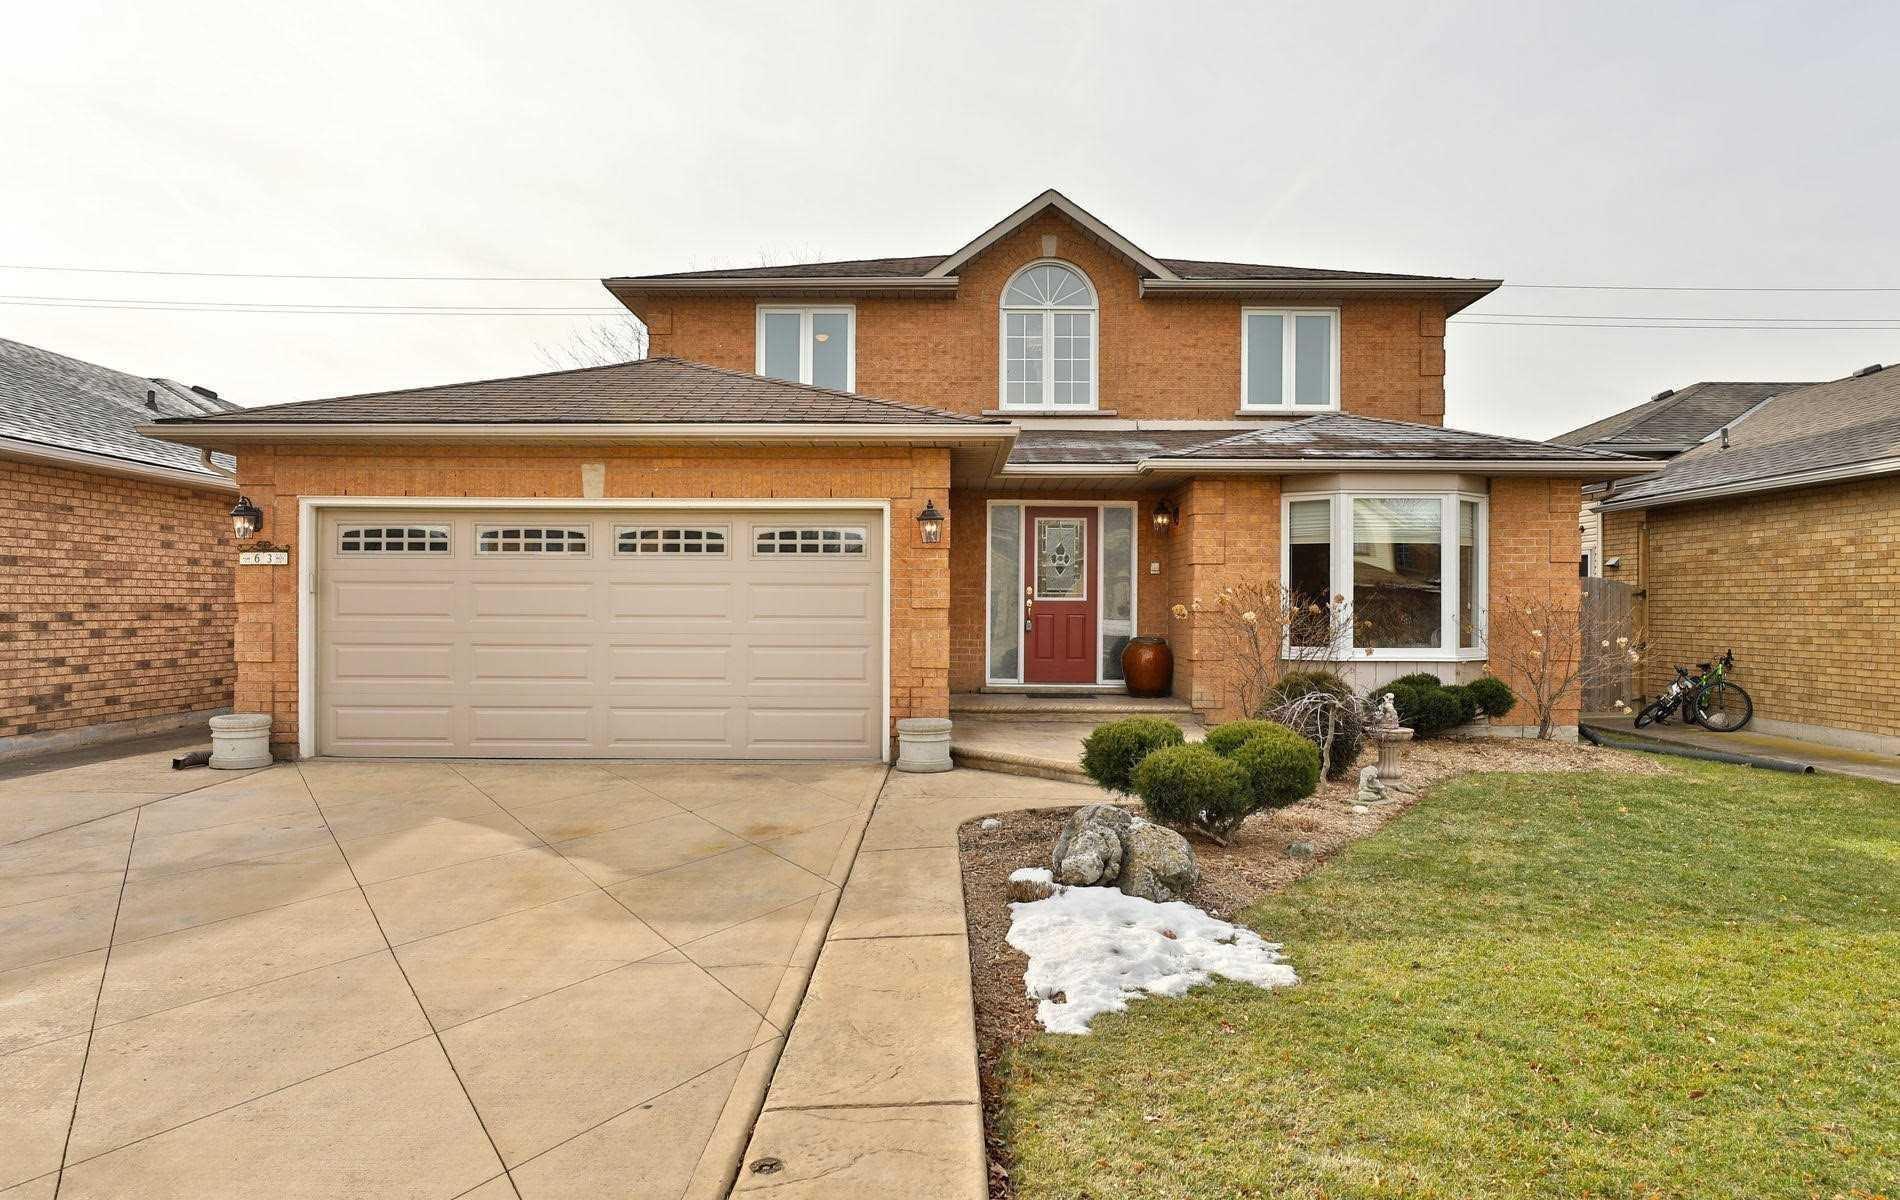 Main Photo: 63 Riviera Ridge in Hamilton: Stoney Creek House (2-Storey) for sale : MLS®# X4691570